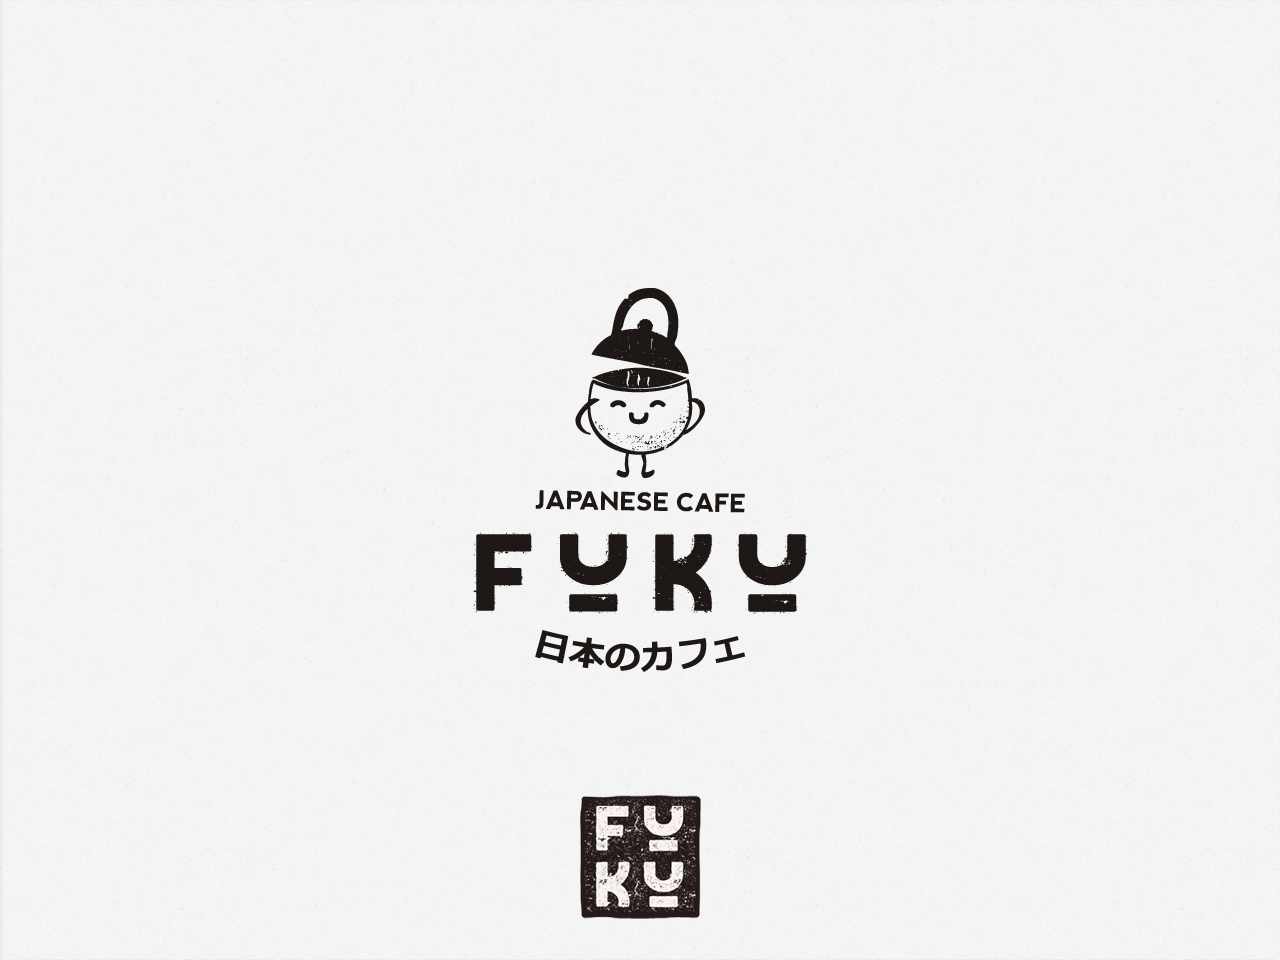 cafe logo design ideas